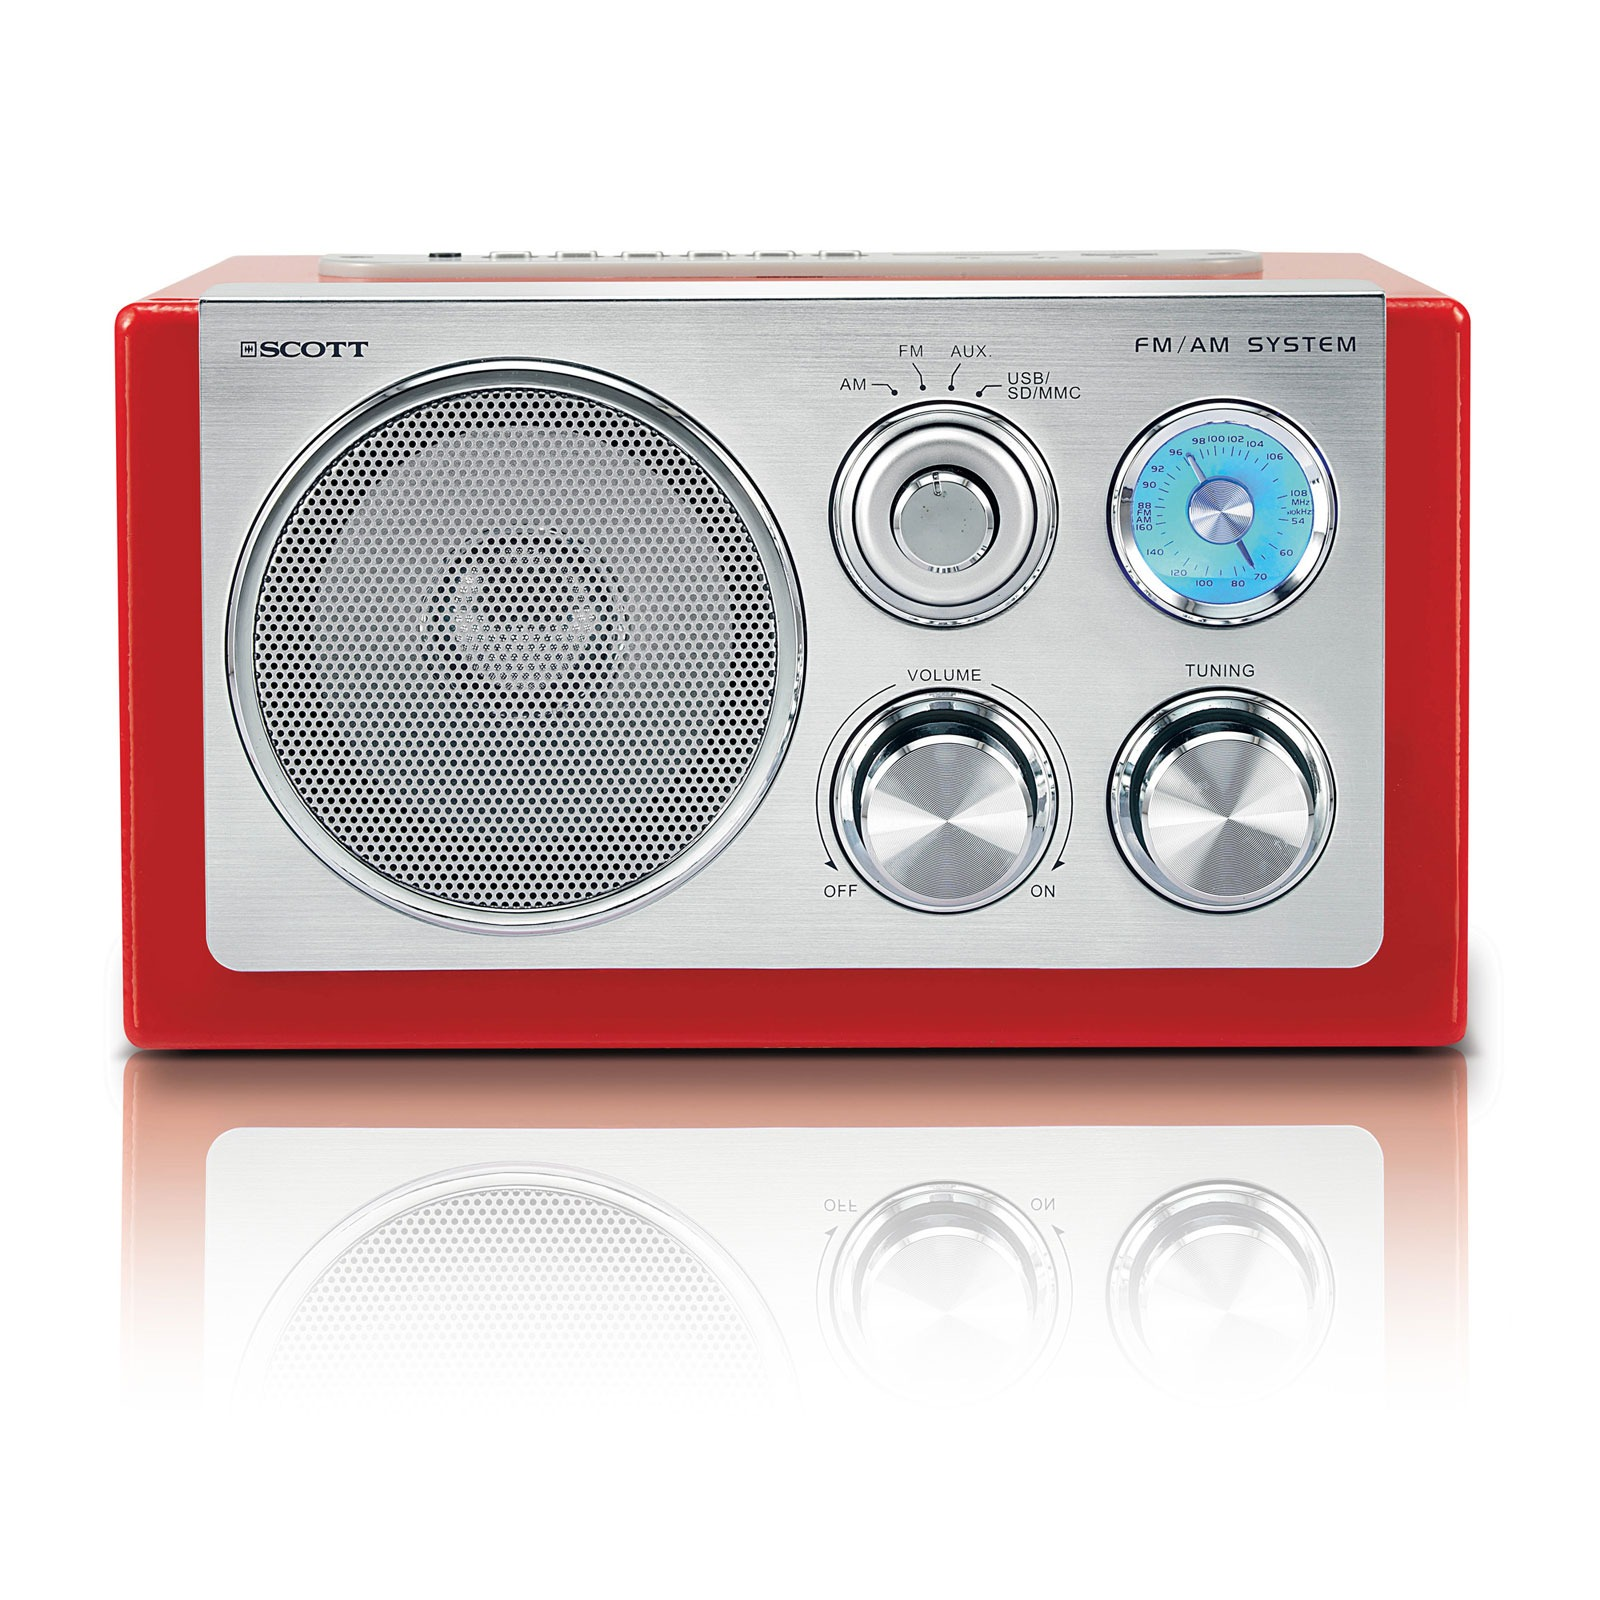 scott rx 19 retro rouge radio radio r veil scott sur. Black Bedroom Furniture Sets. Home Design Ideas